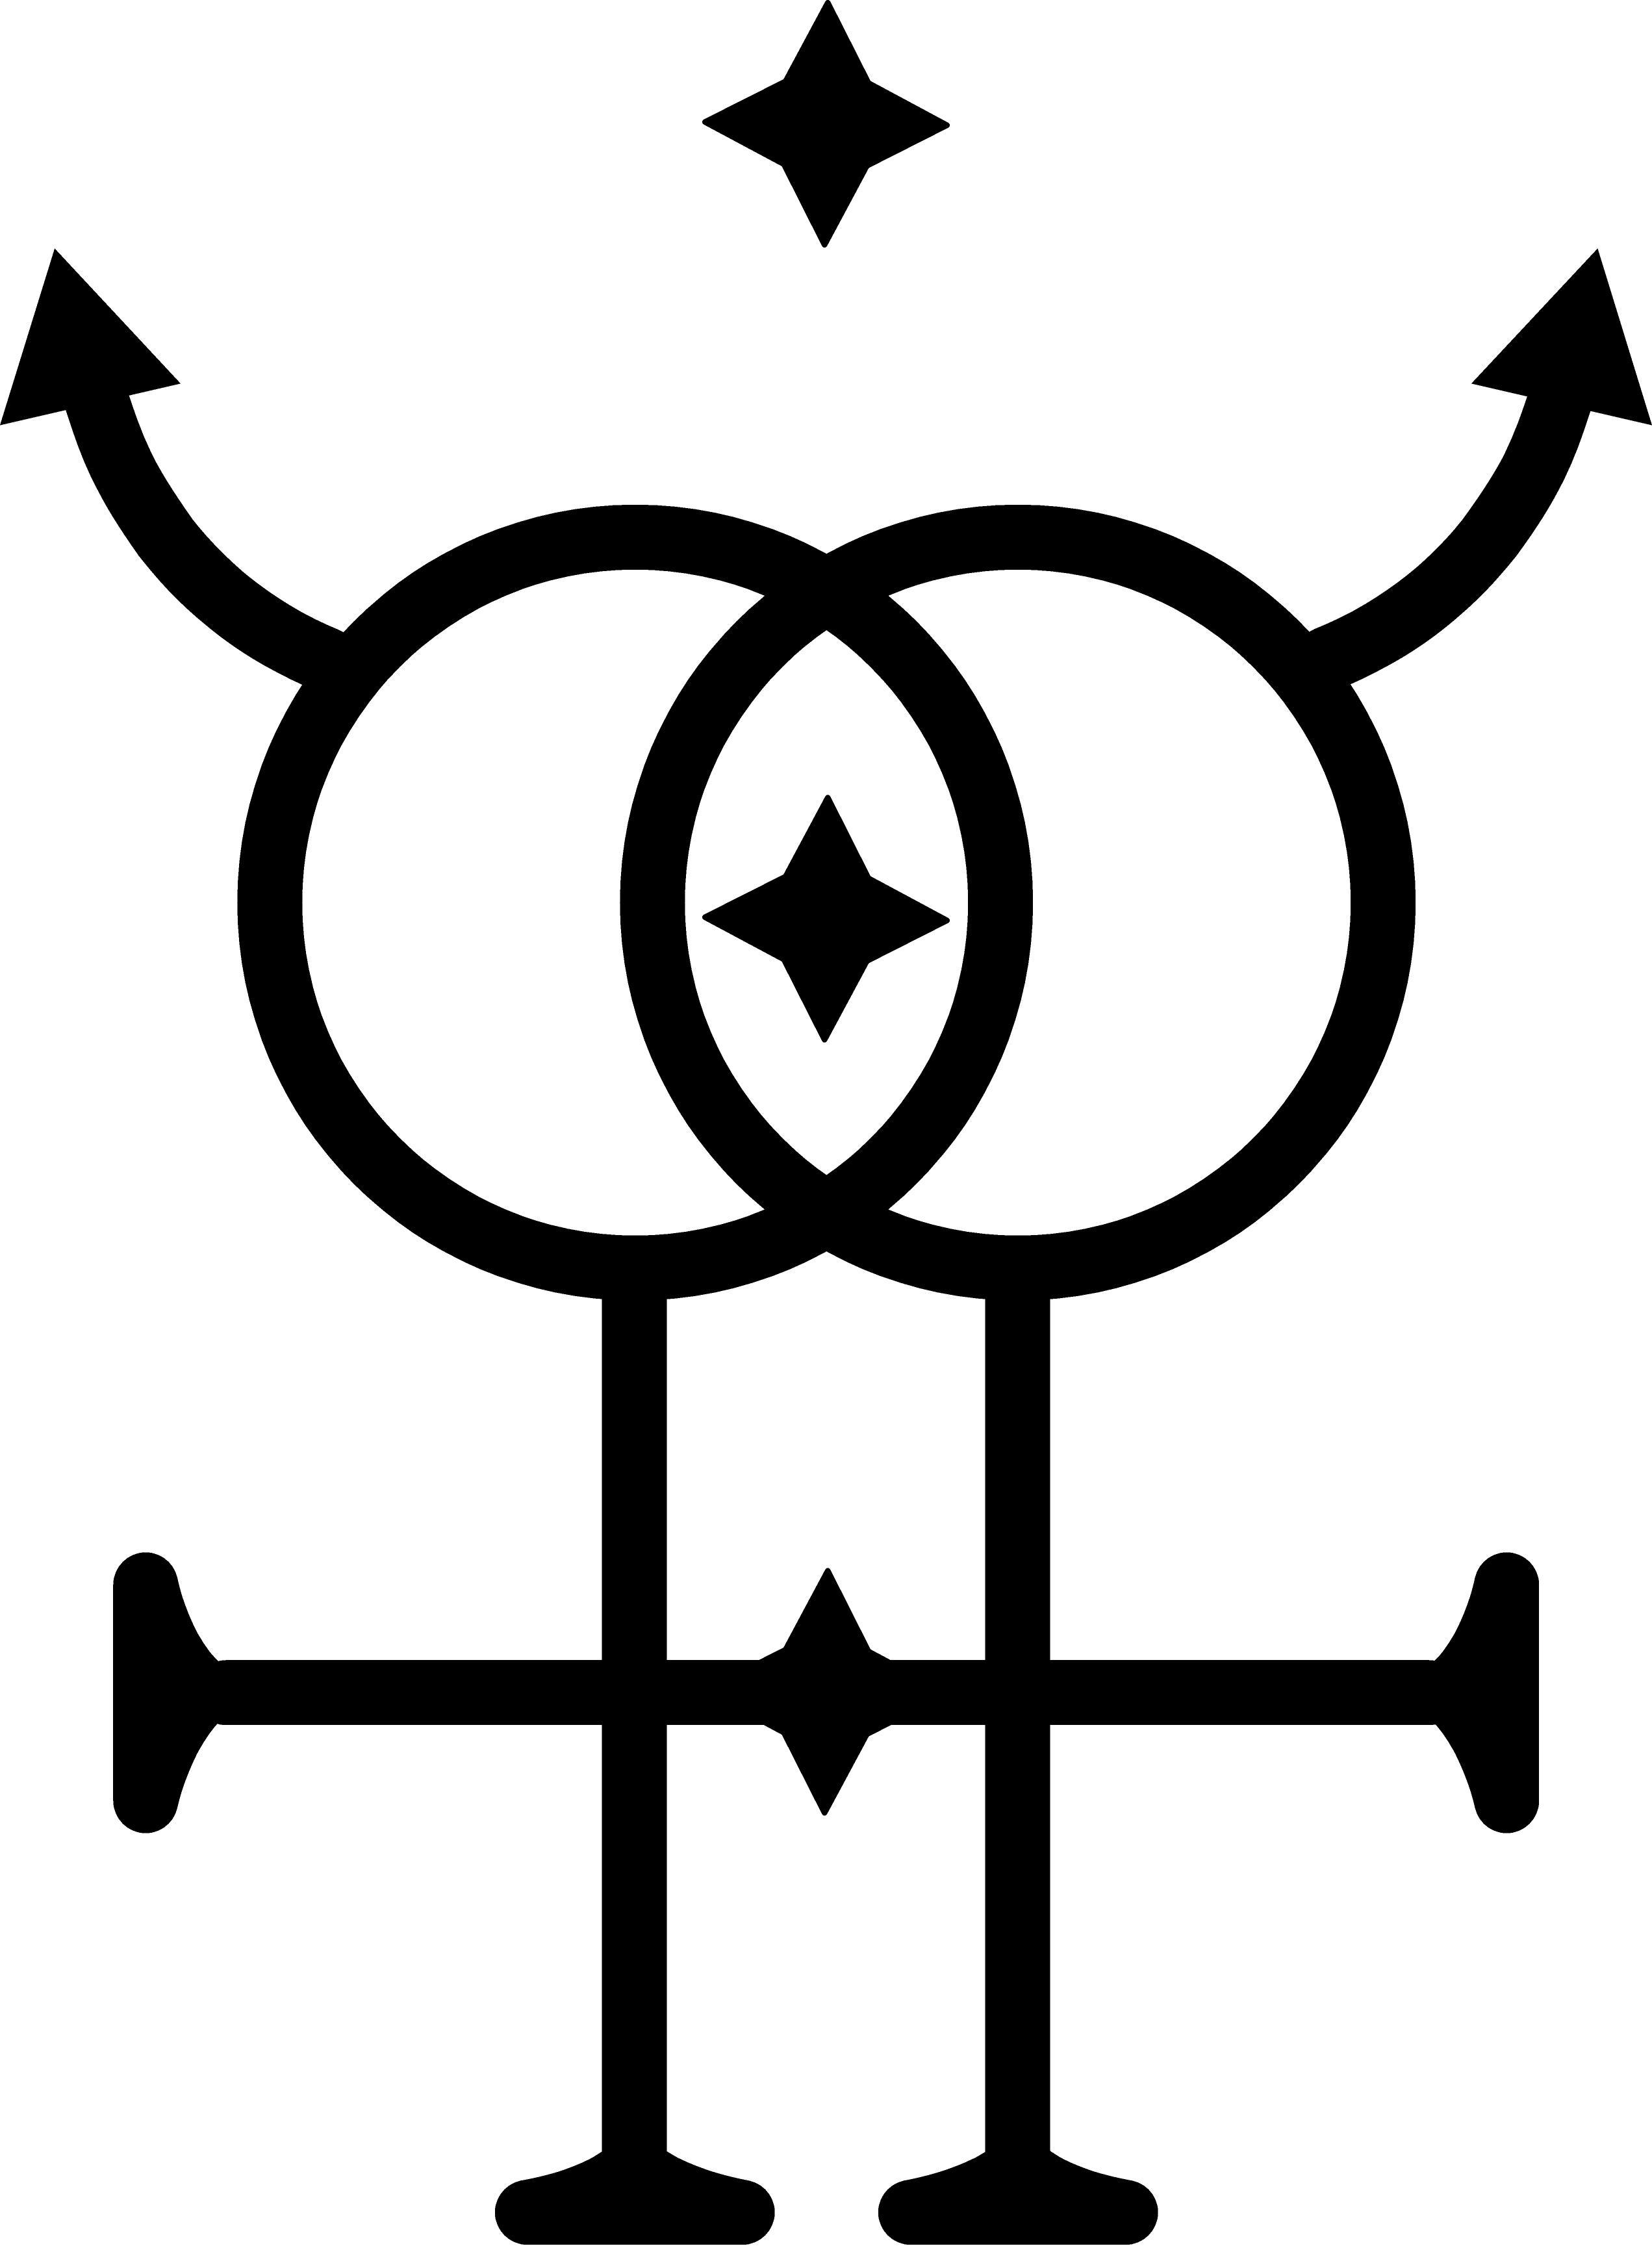 Temple of witchcraft love will wisdom gemini biocorpaavc Choice Image